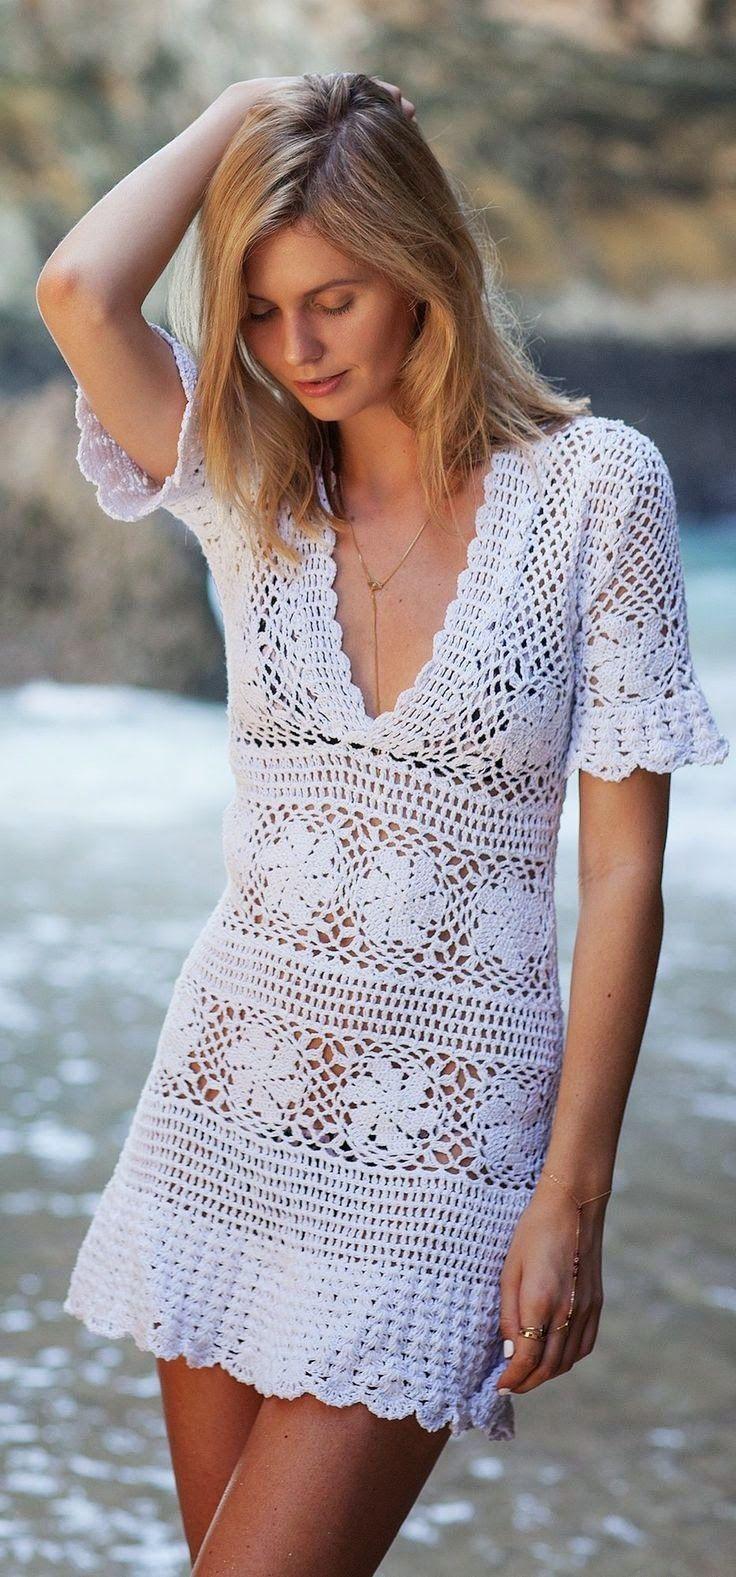 Crochetemoda: Vestidos de Crochet                                                                                                                                                     Mais